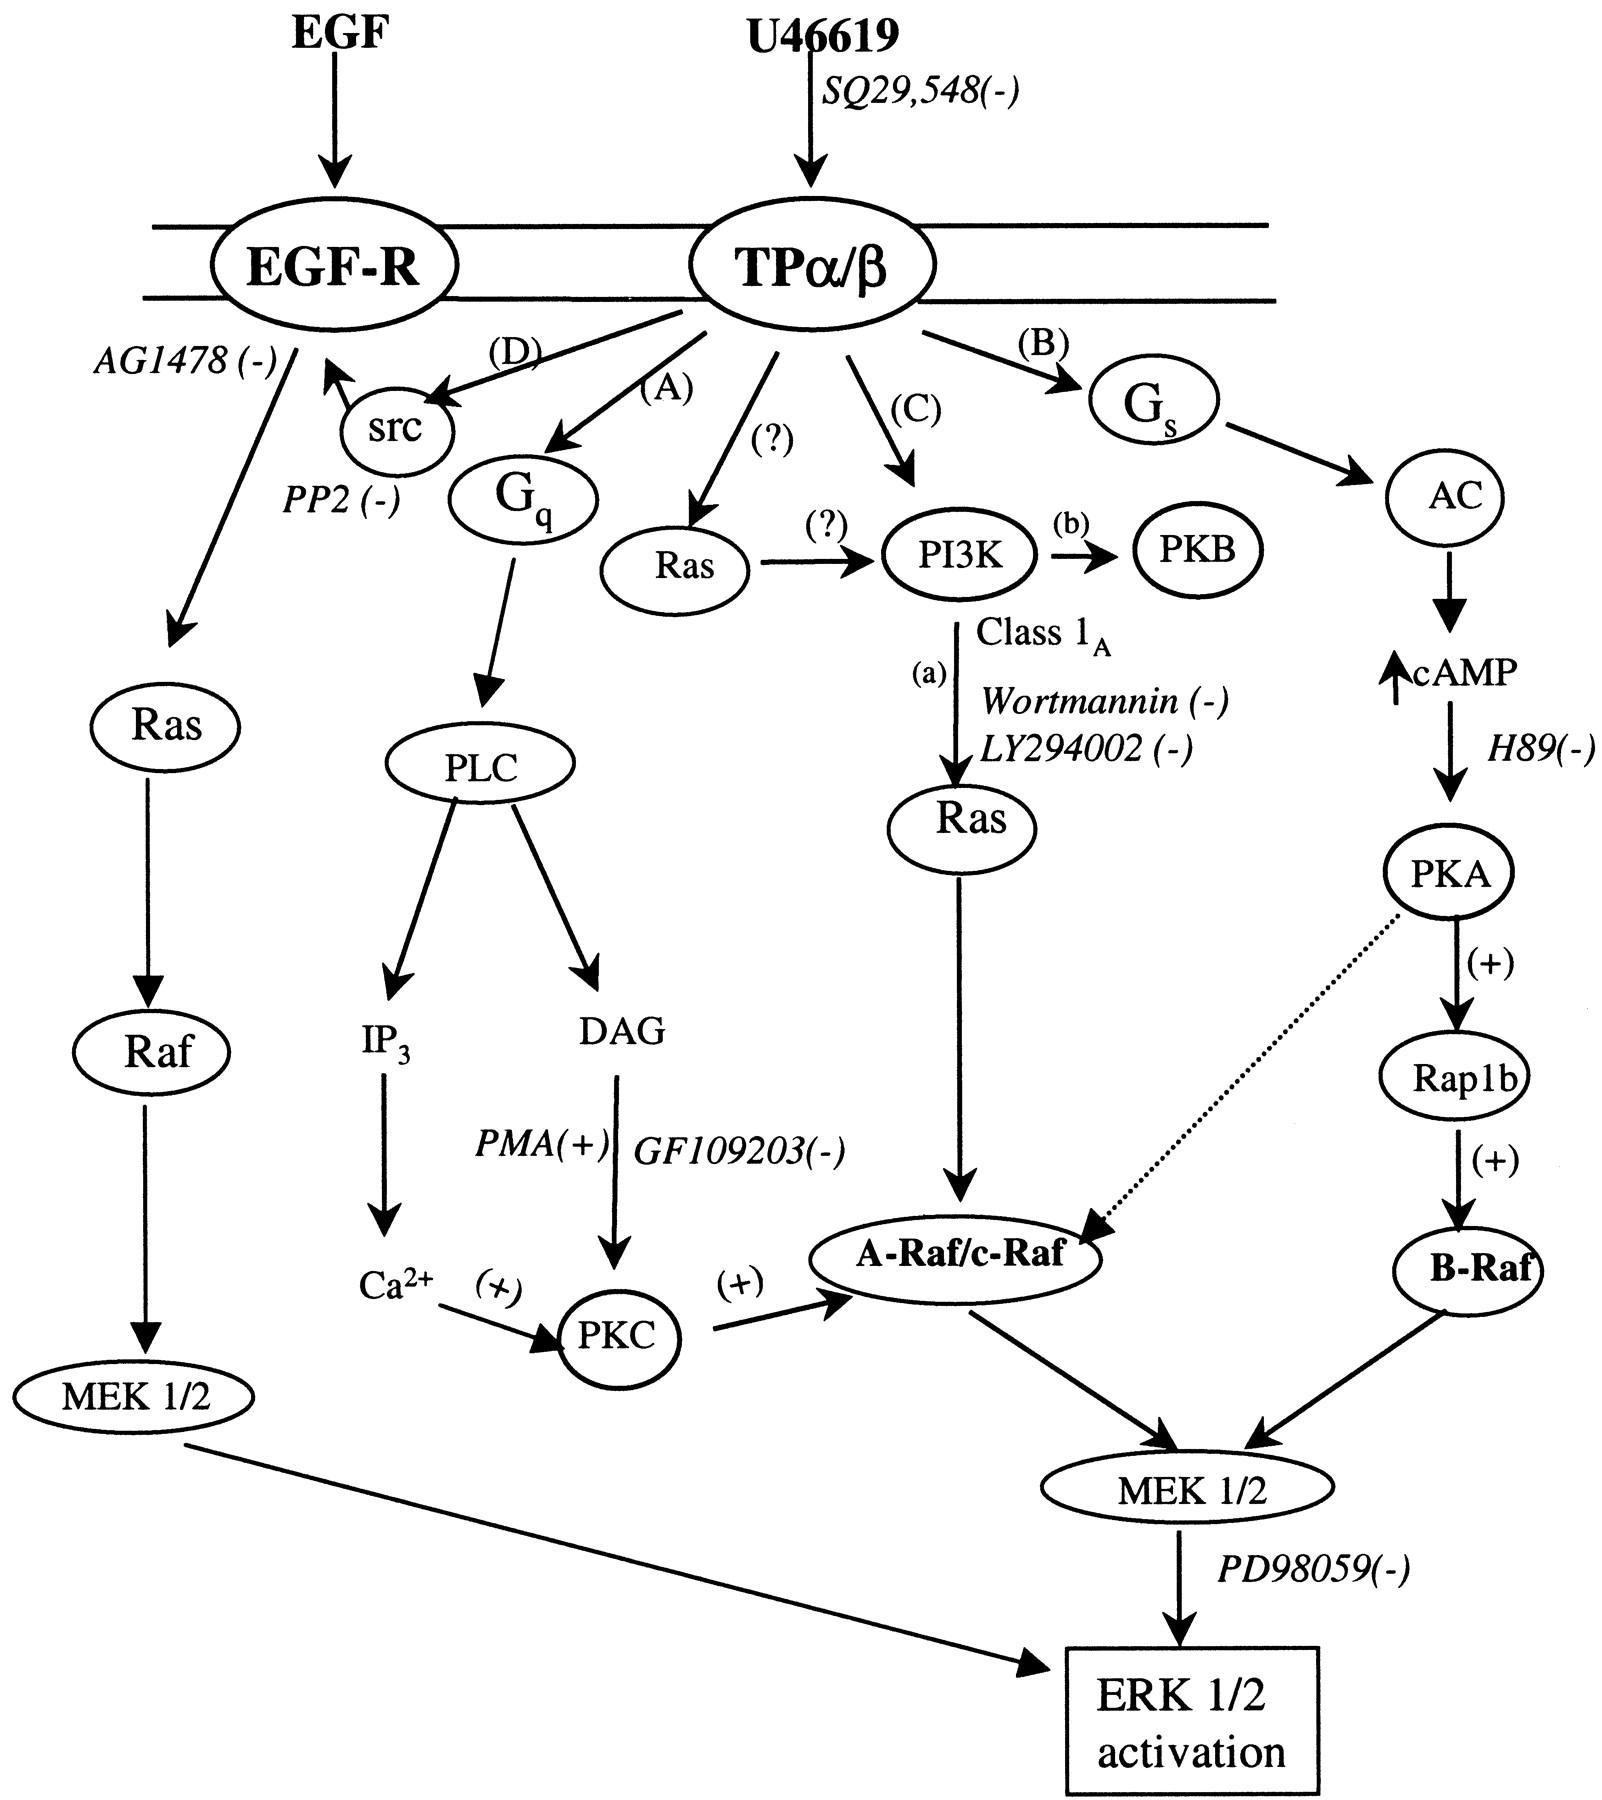 Ashton Guitar Wiring Diagram Database Regulation Of Extracellular Signal Regulated Kinase Cascades By Strat